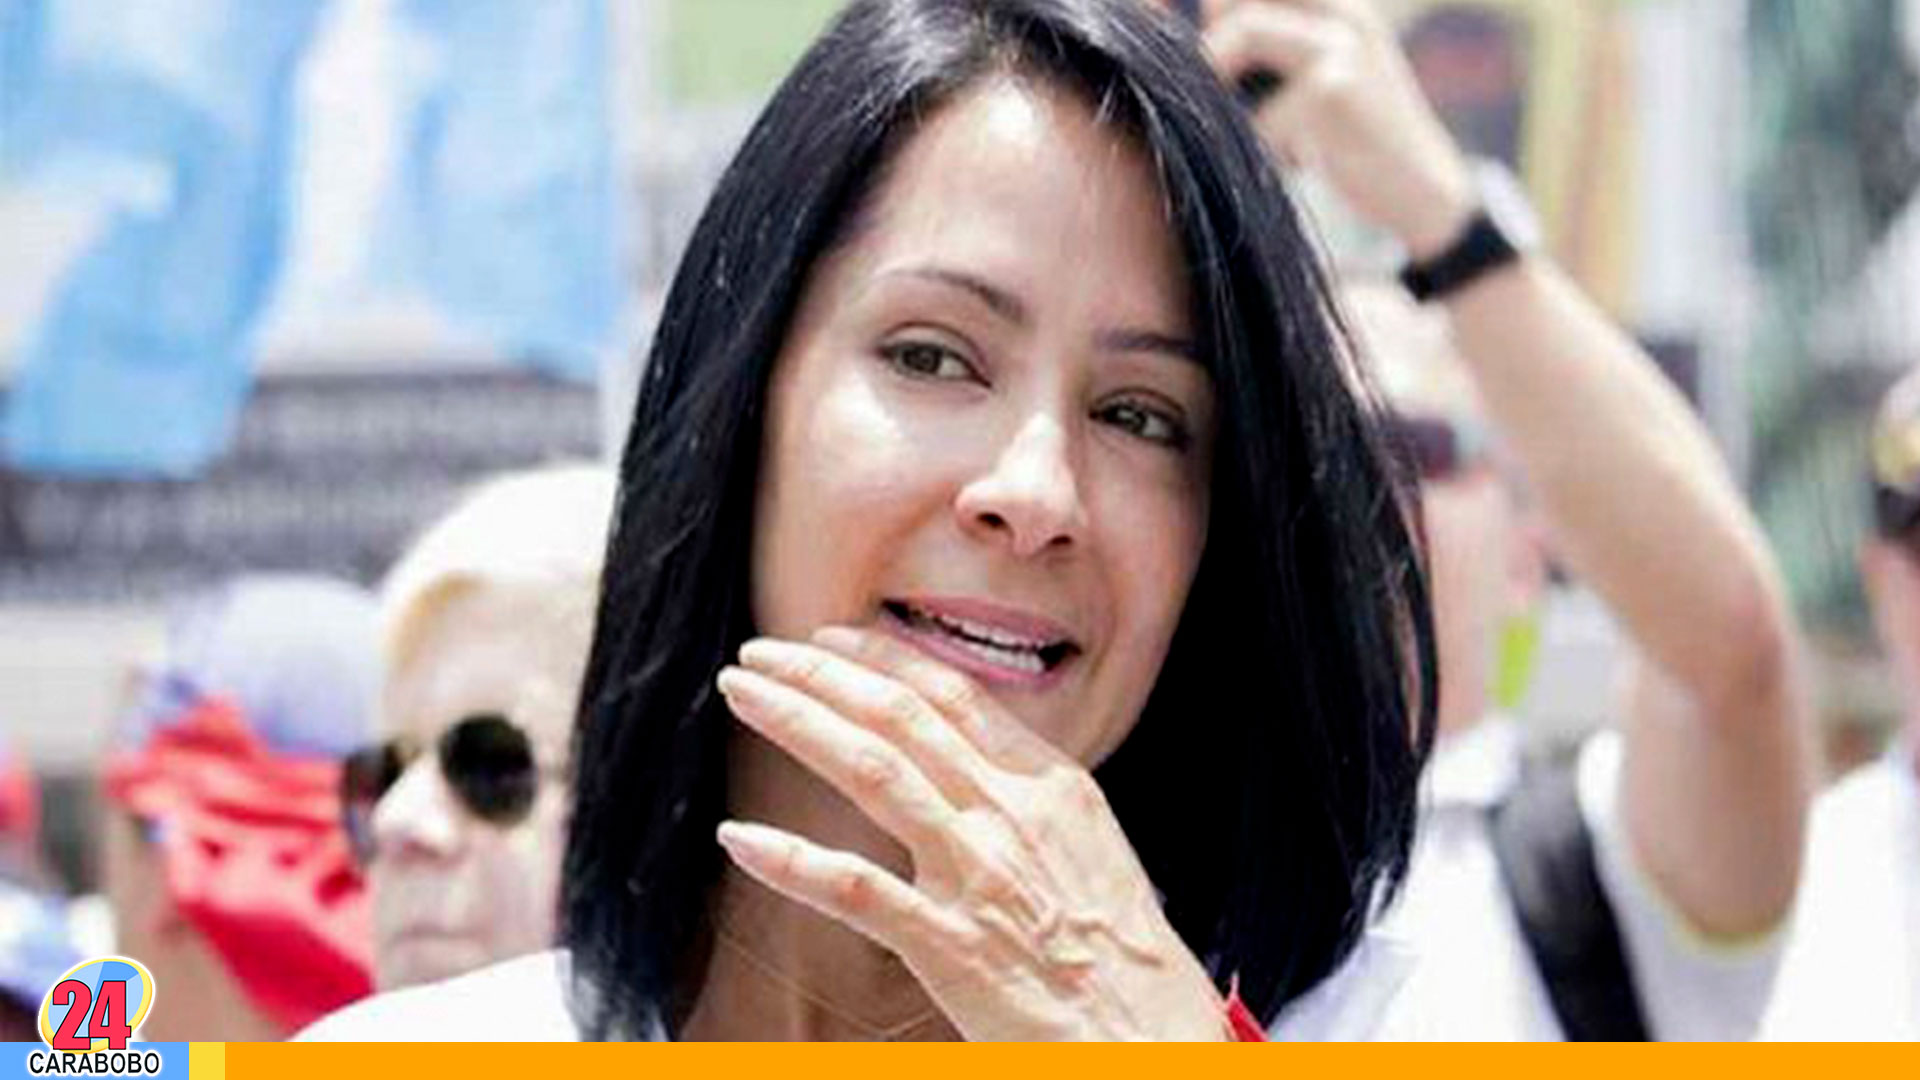 WEB-N24Carabobo-NORKYS-BATISTA-ECHÓ-PALOS-DIJO-DE-TODO-(+VÍDEO) - Noticias 24 Carabobo